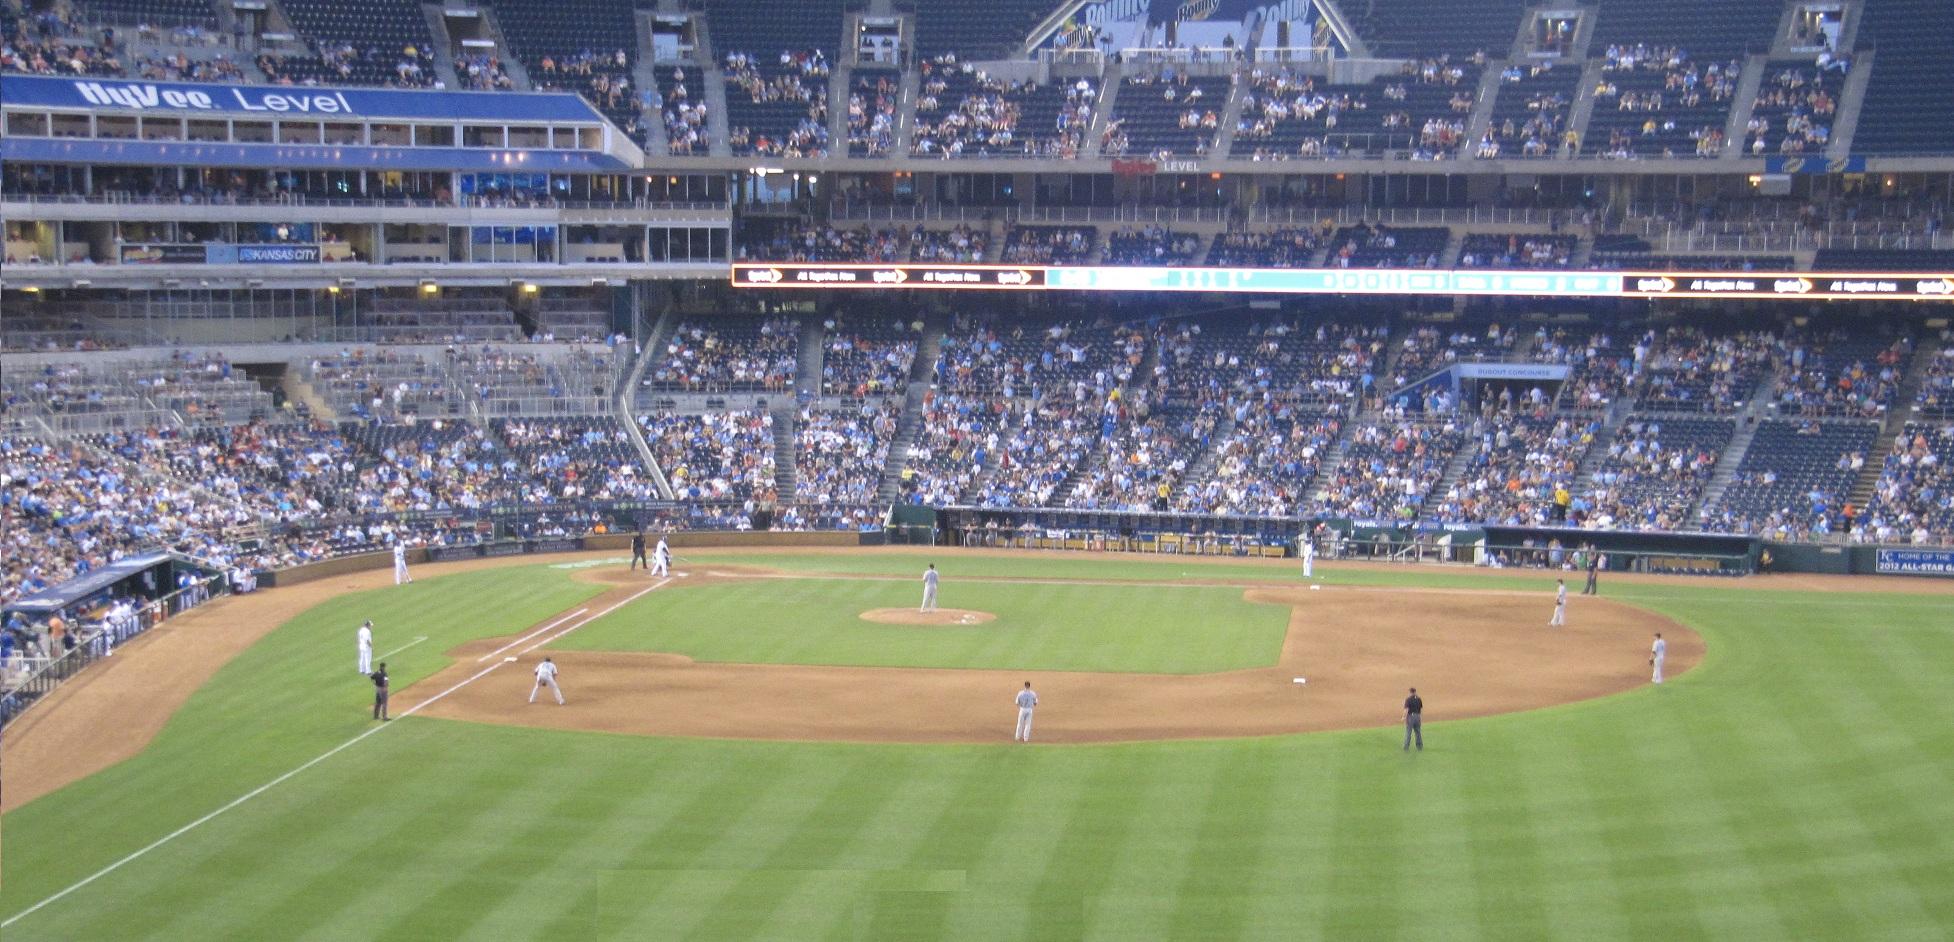 Best Seats Kansas City Royals At Kauffman Stadium 2016 Alcs And